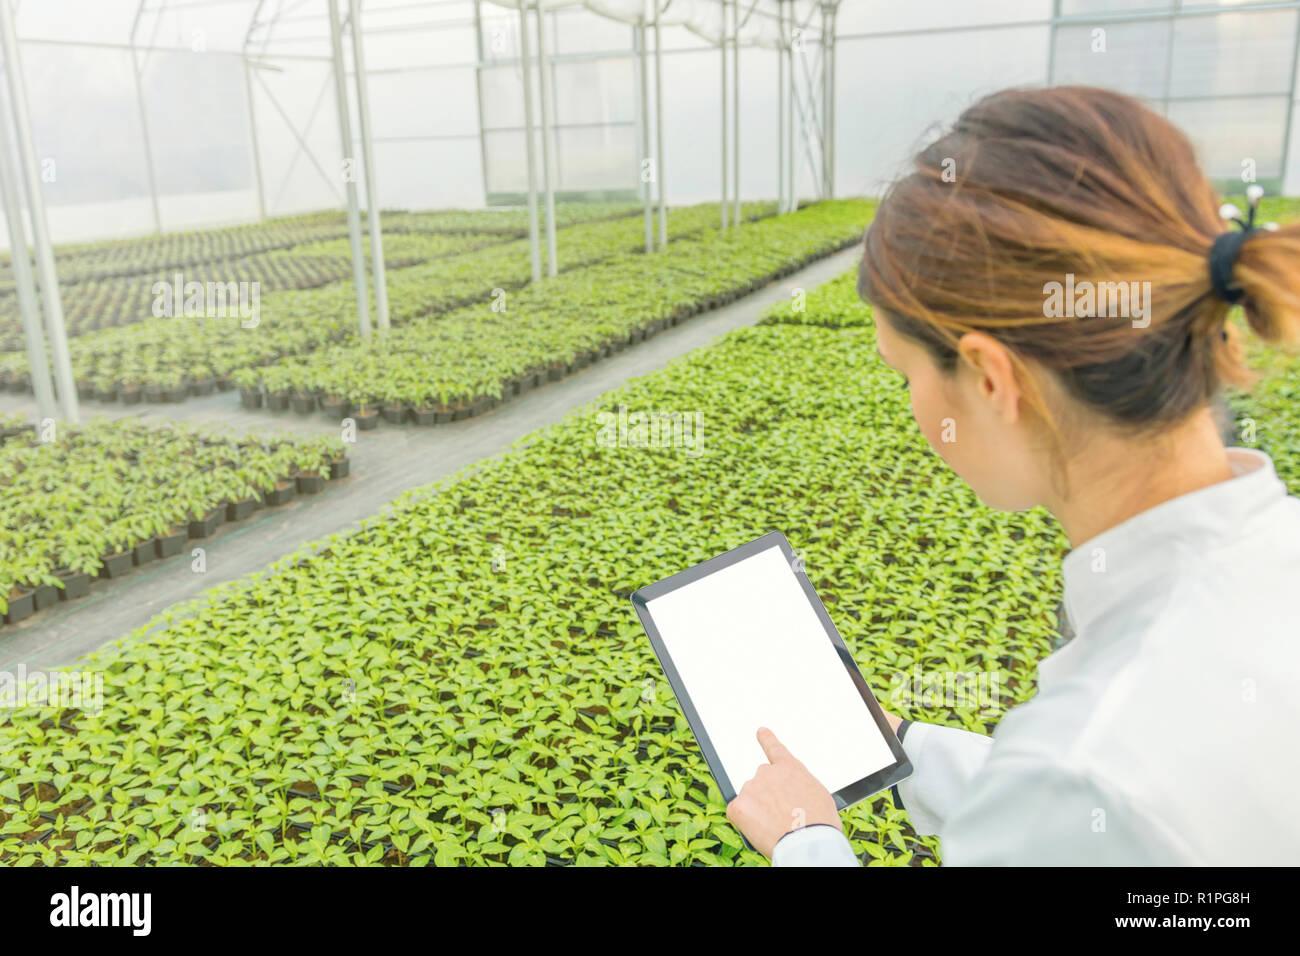 Female Biotechnology engineer tablet greenhouse. Plant seedlings growing greenhouse spring. - Stock Image